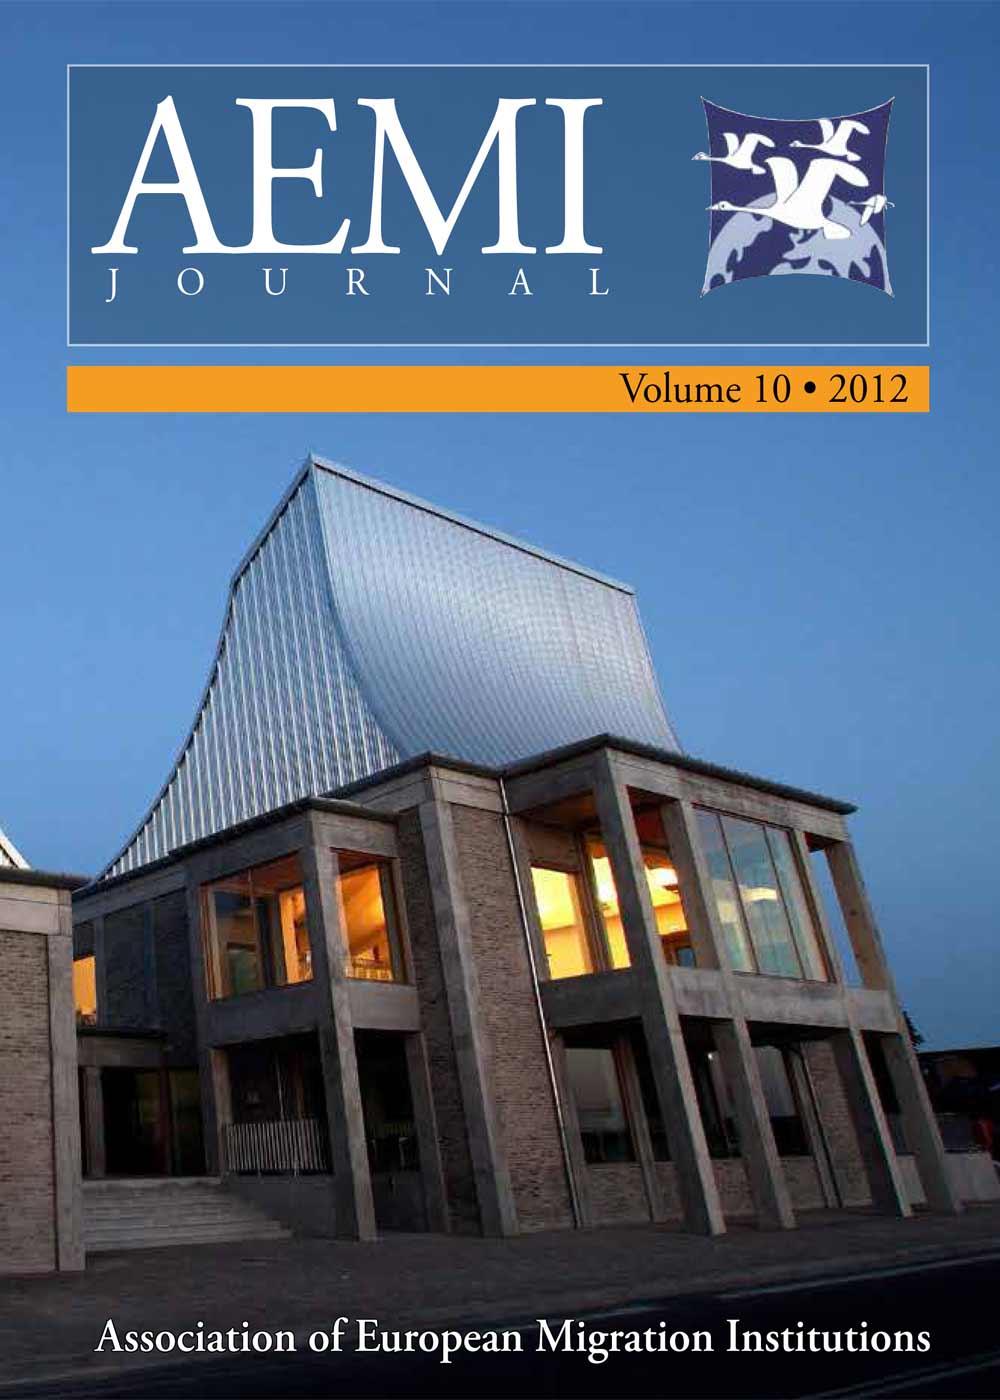 AEMI Journal – Volume 10 (2012)